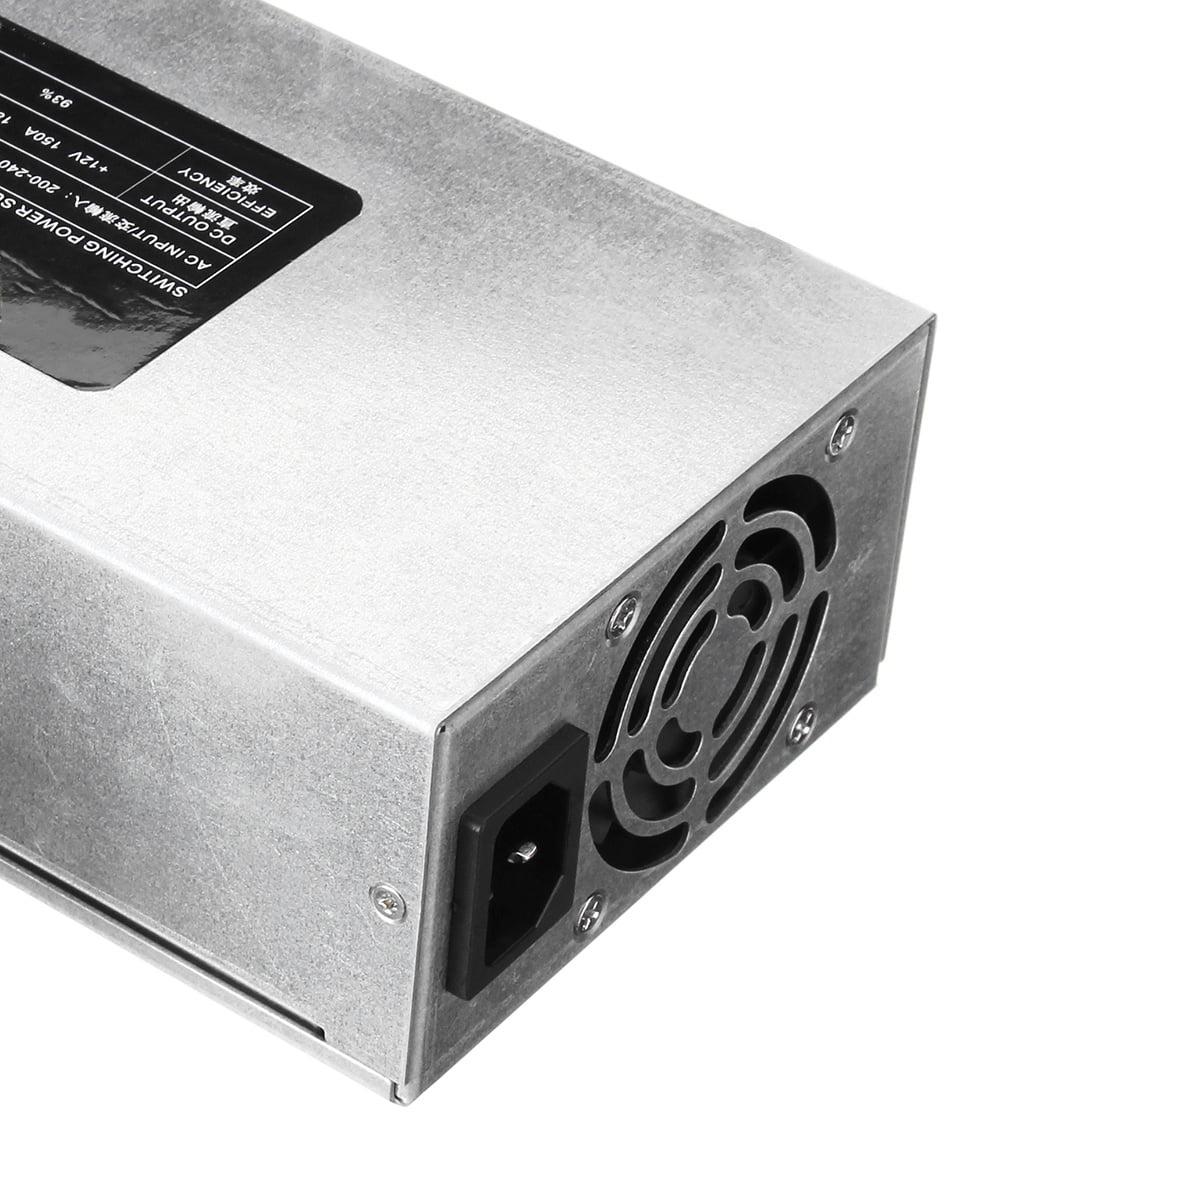 1800W Mining Power Supply for ETH Miner Ethereum Mining Machine 93%Efficiency